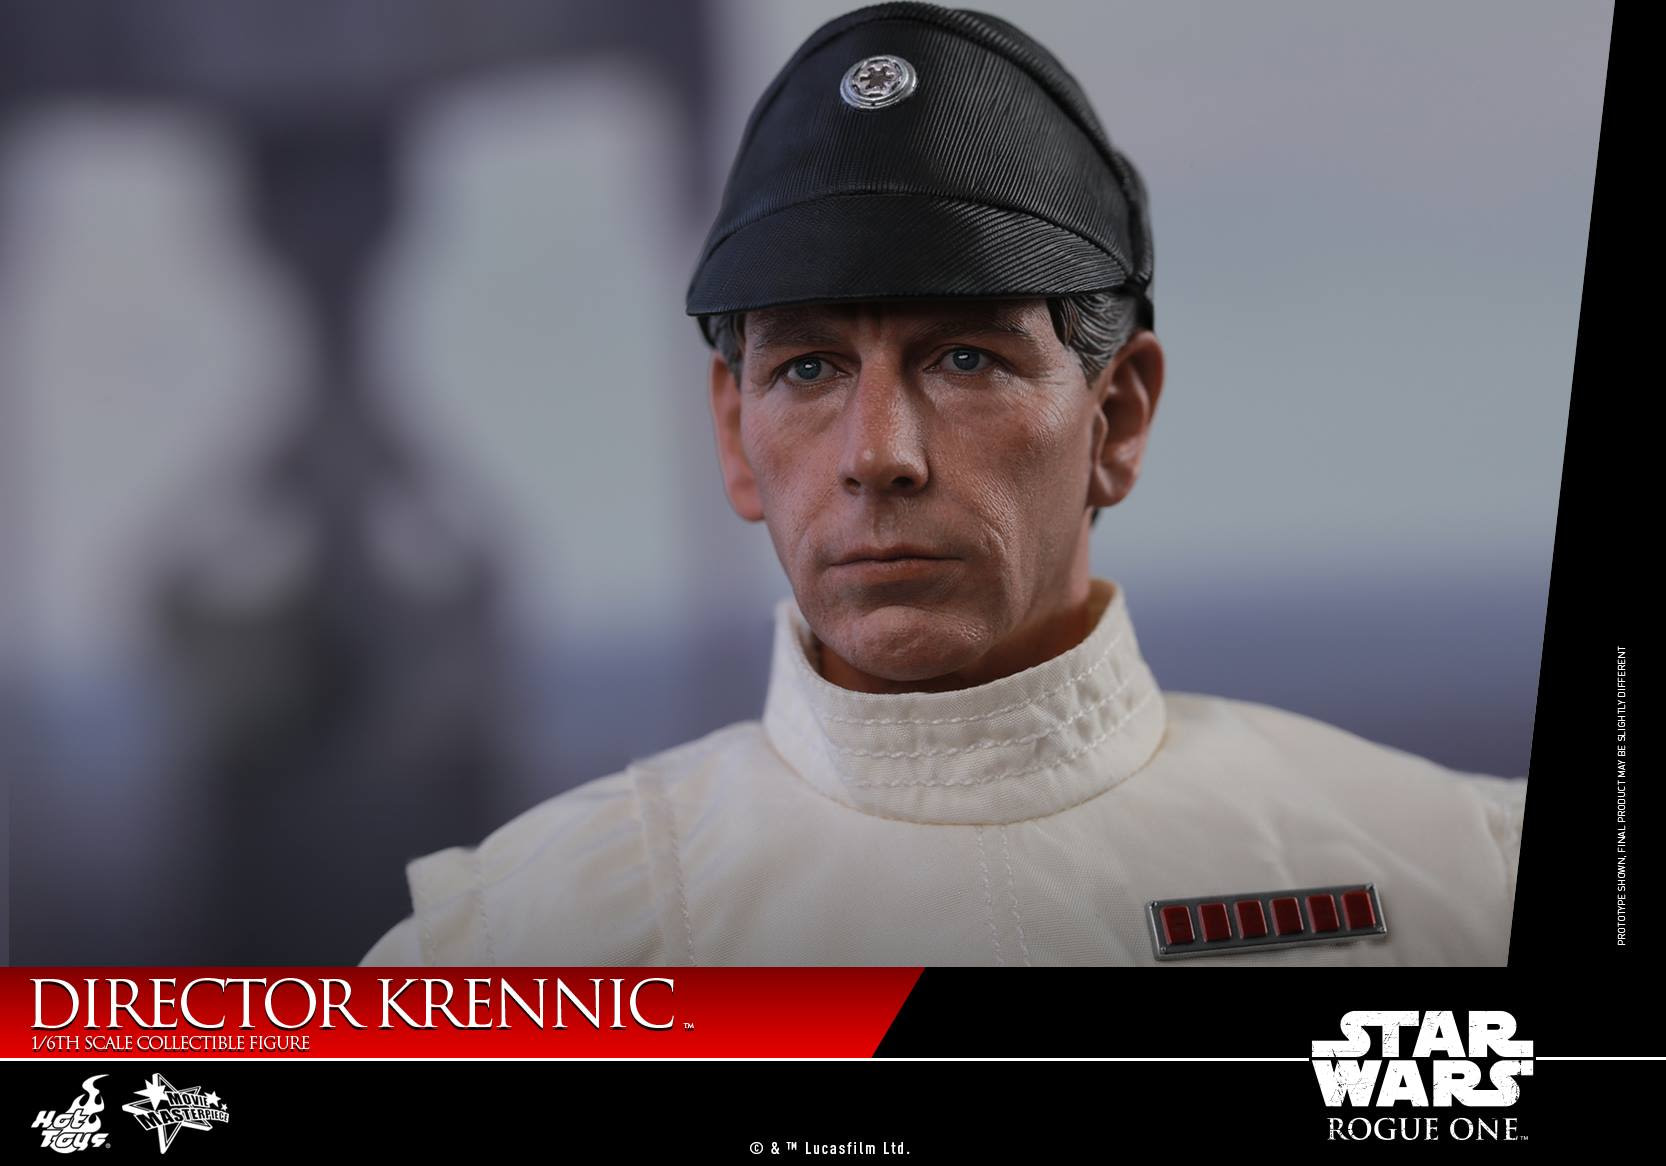 Star Wars Hot Toys Director Krennic 7